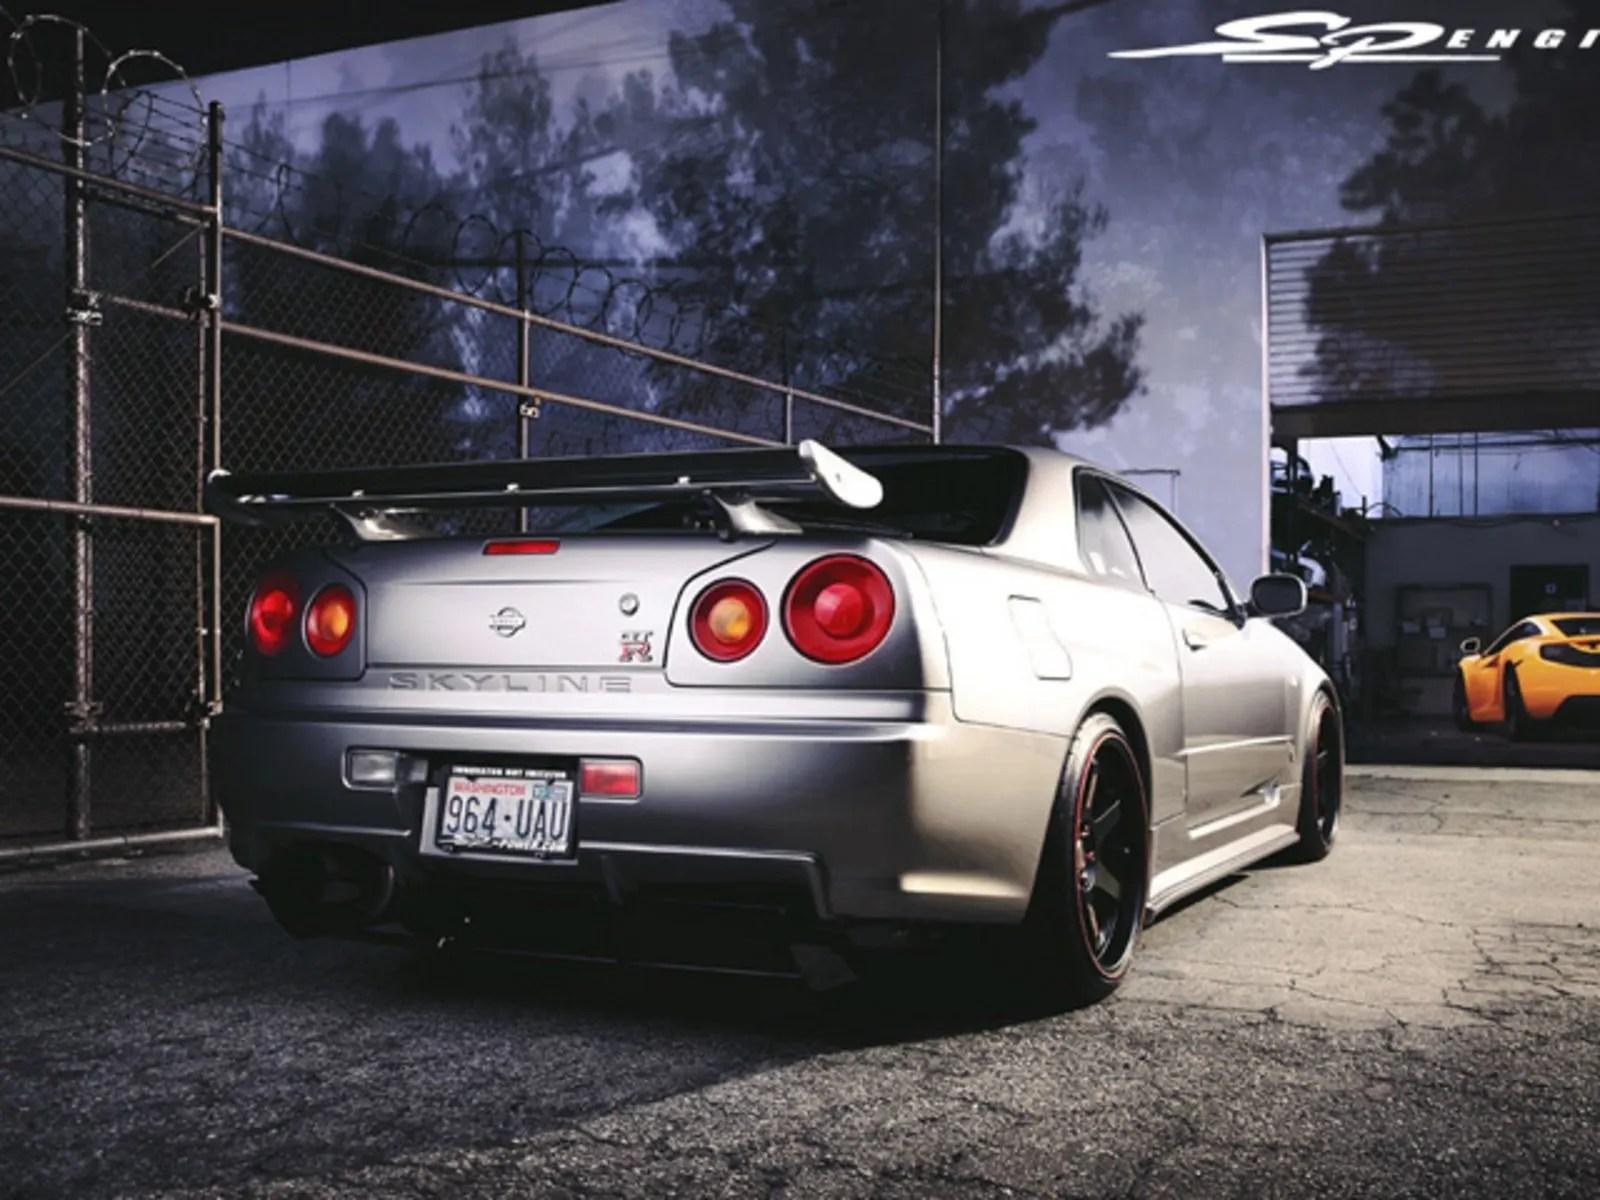 Drift Car Wallpaper Hd 2012 Nissan Gtr Skyline R34 By Sp Engineering Review Top